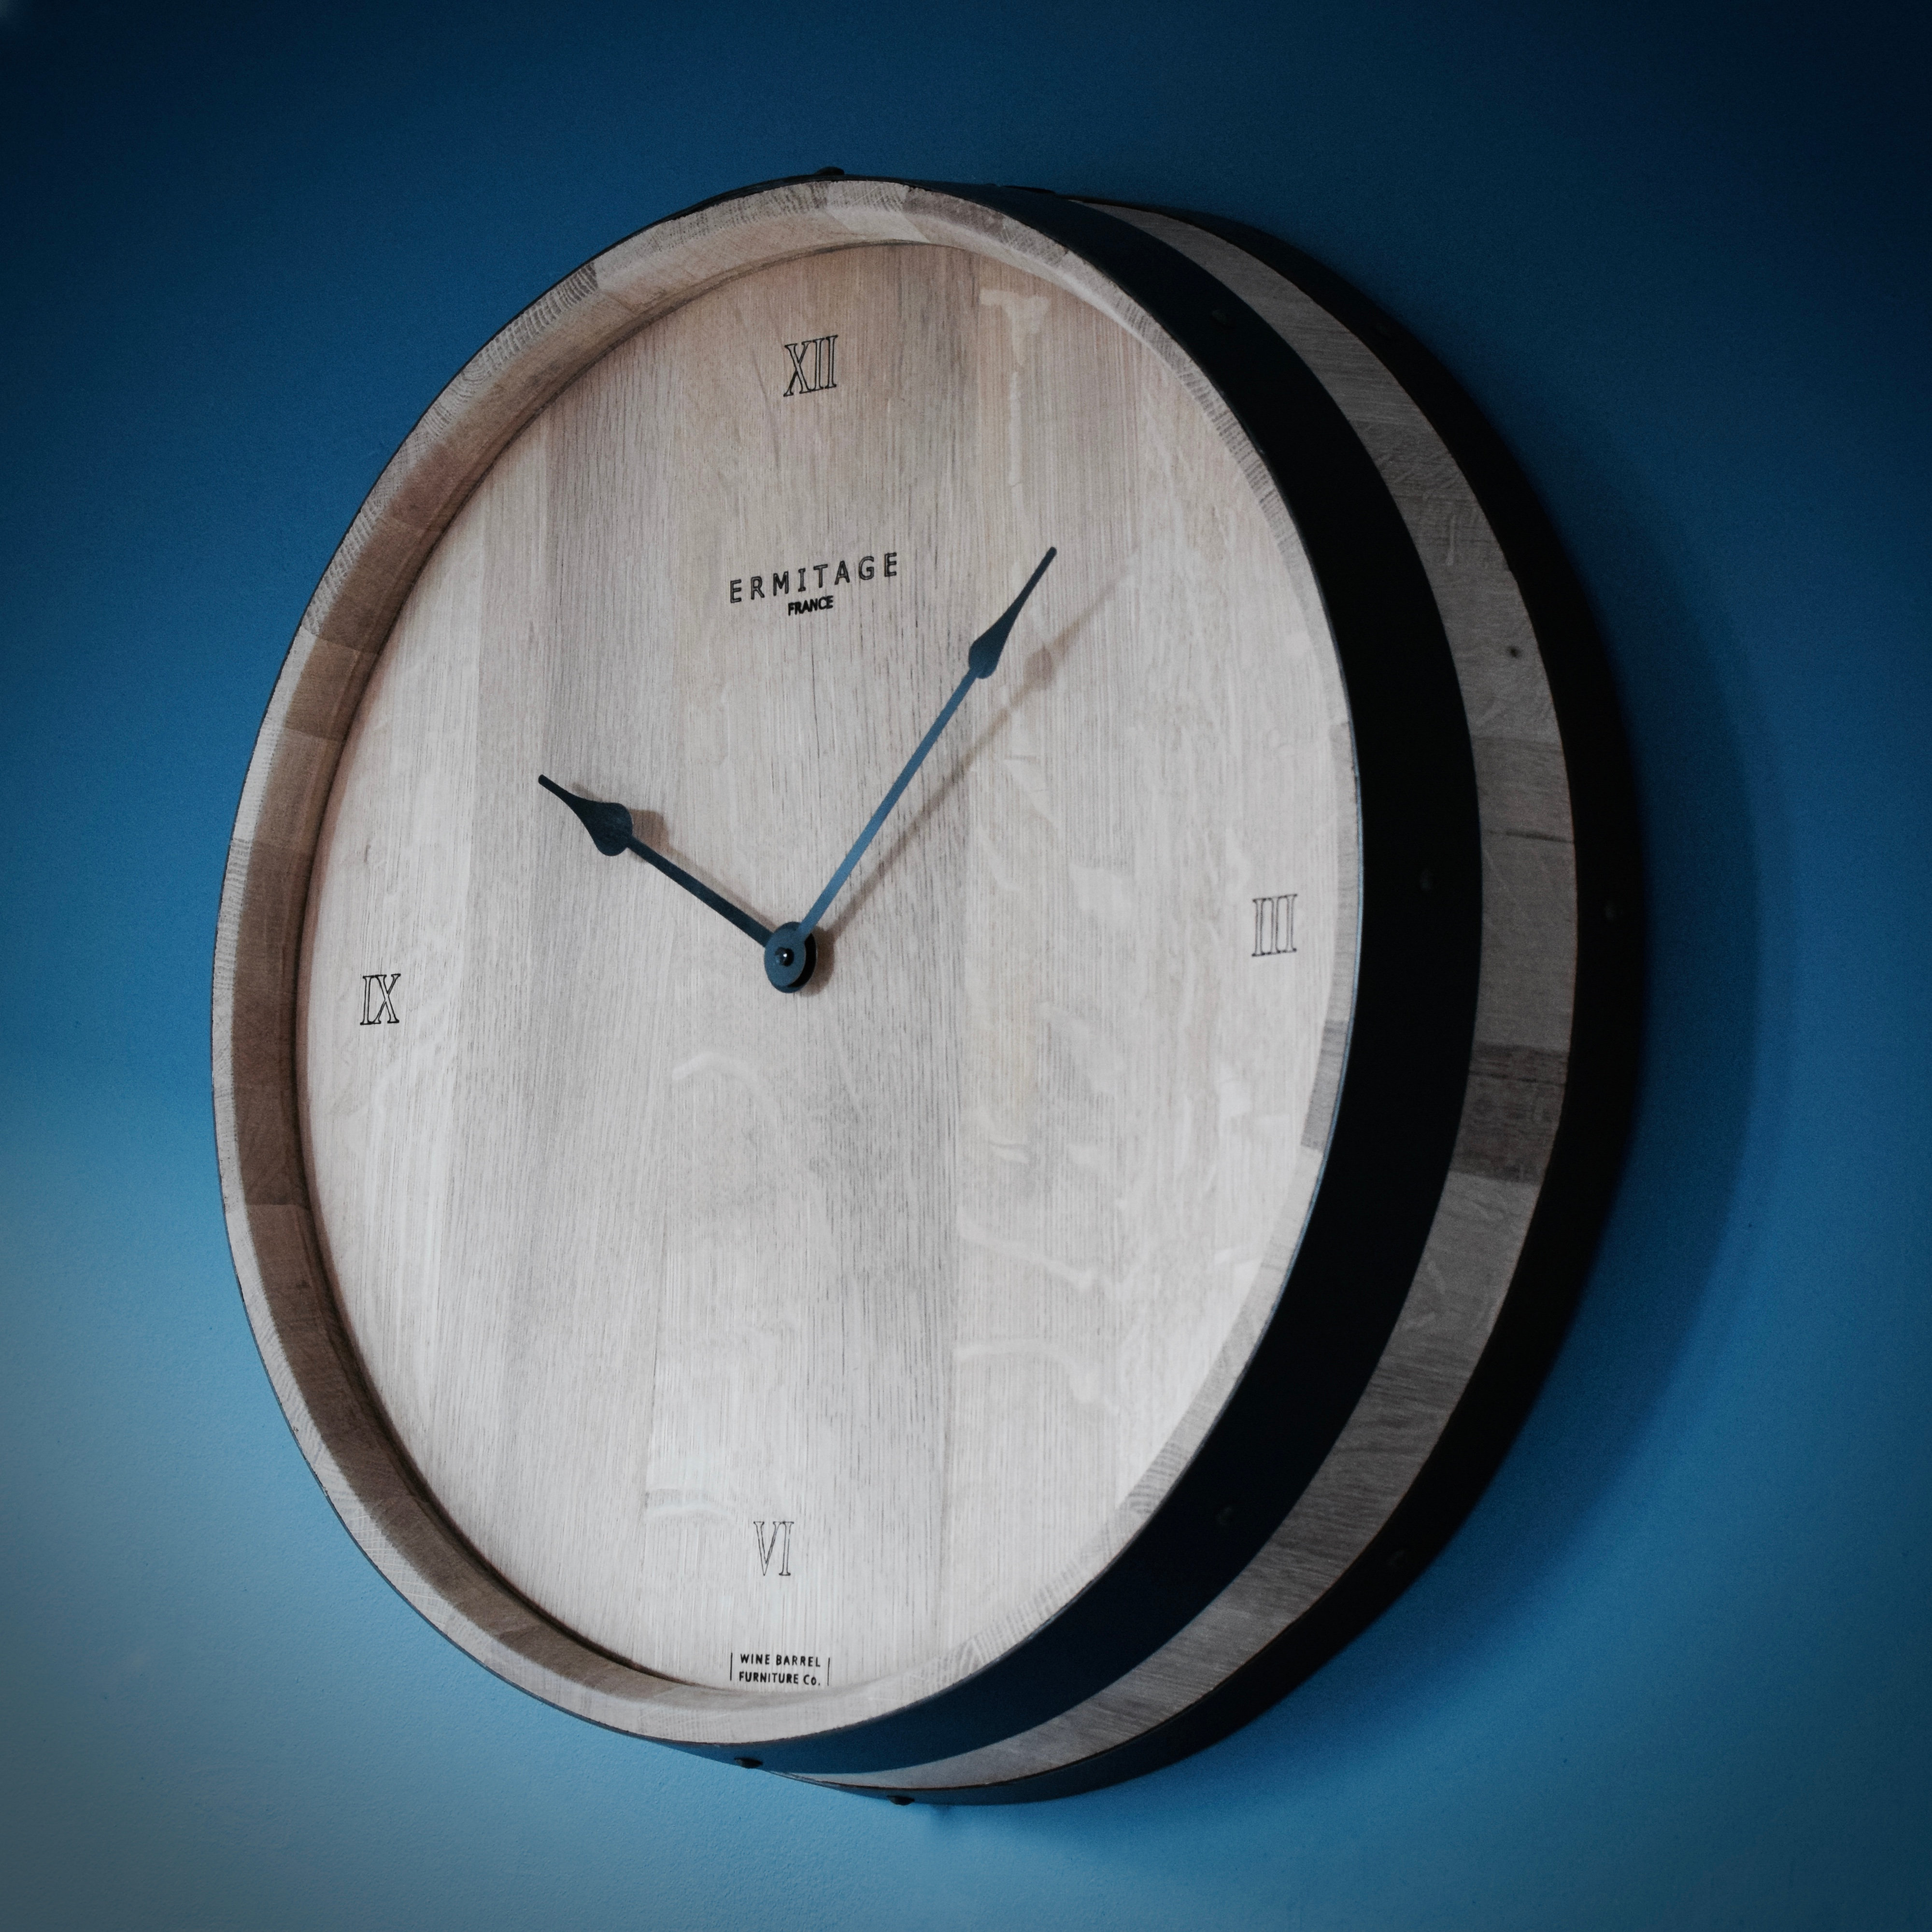 Nannup Wine Clock Mysite